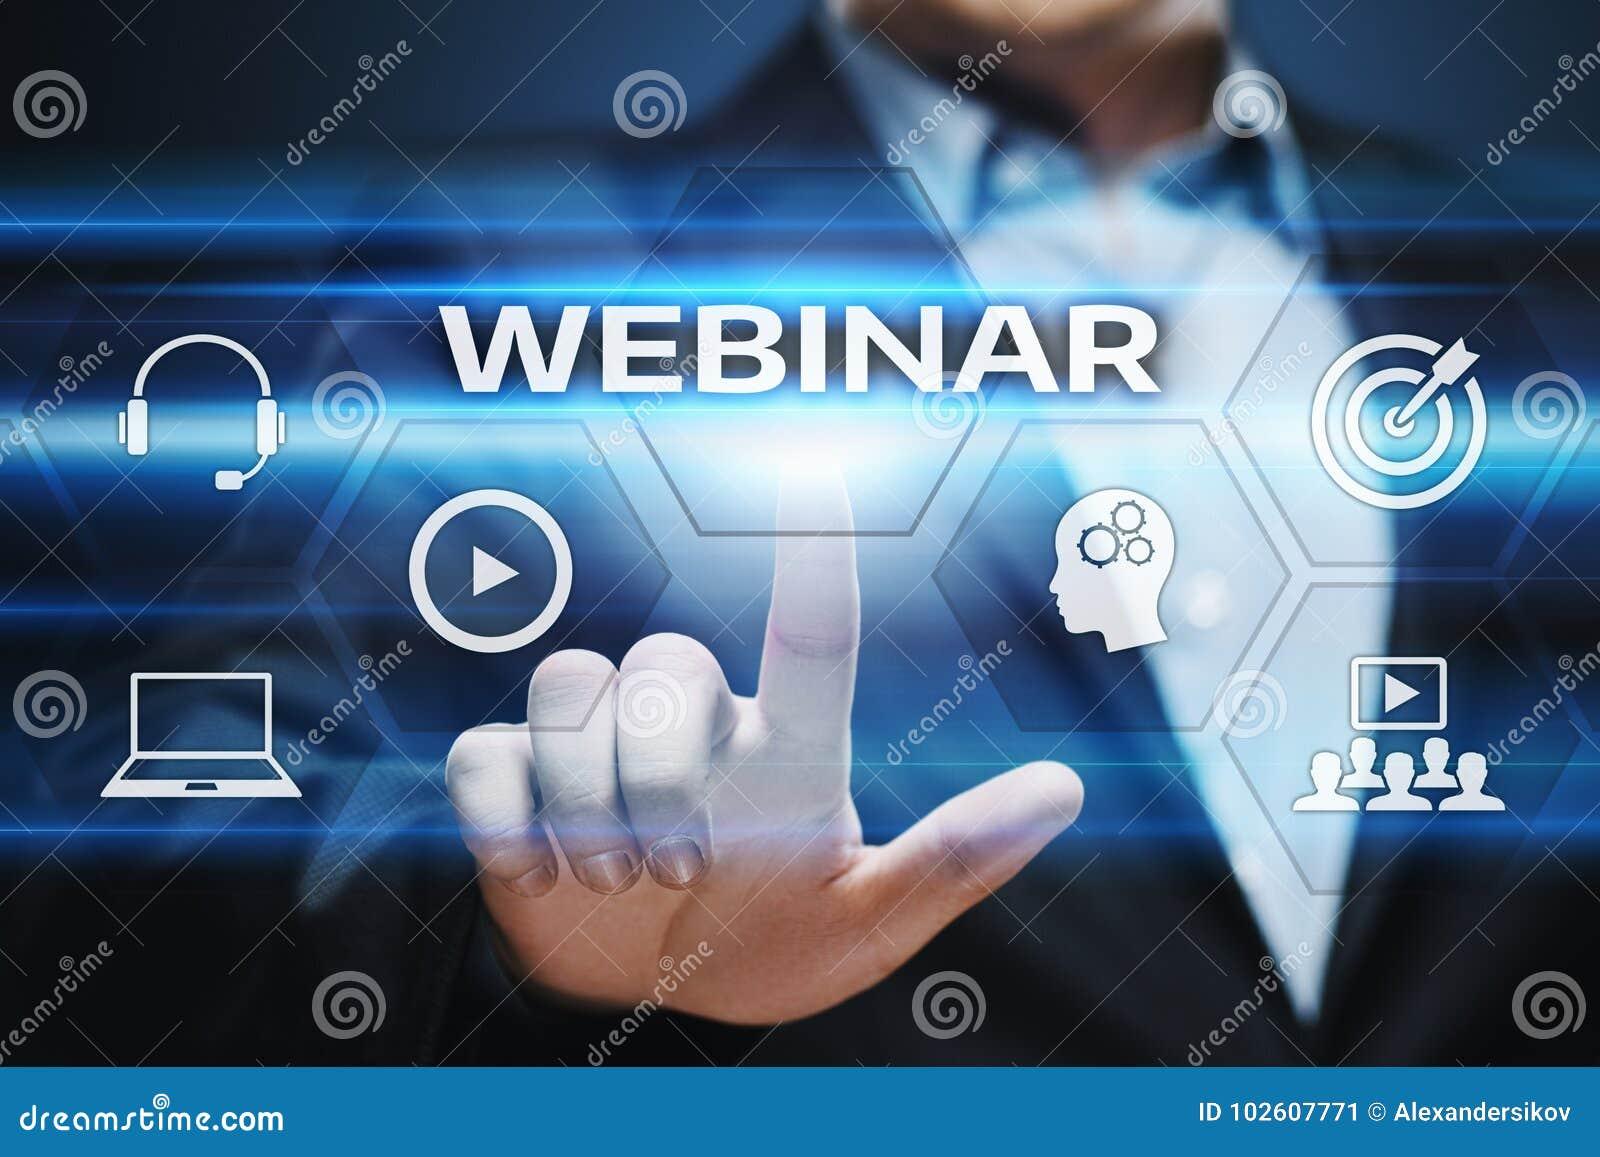 Webinar e learning training business internet technology concept download webinar e learning training business internet technology concept stock image image of management publicscrutiny Images